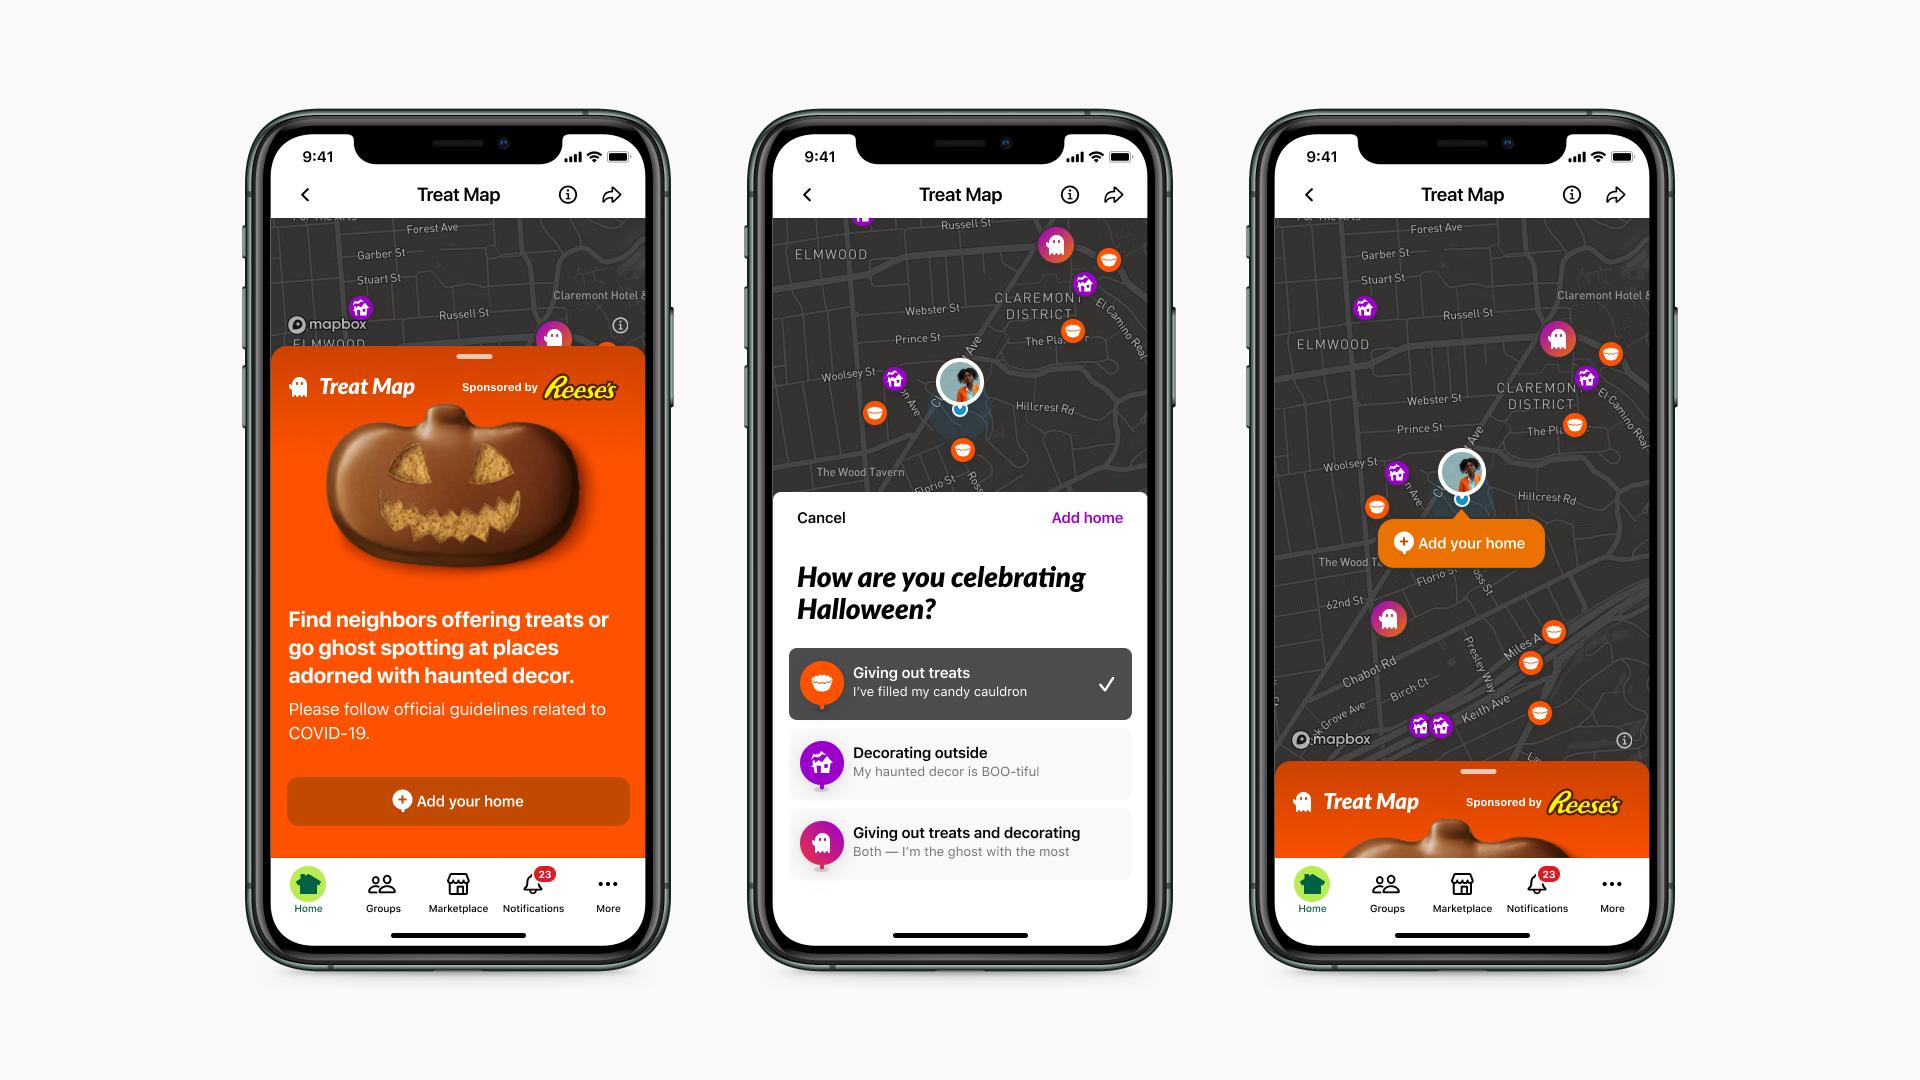 Nextdoor Treat Map App screens